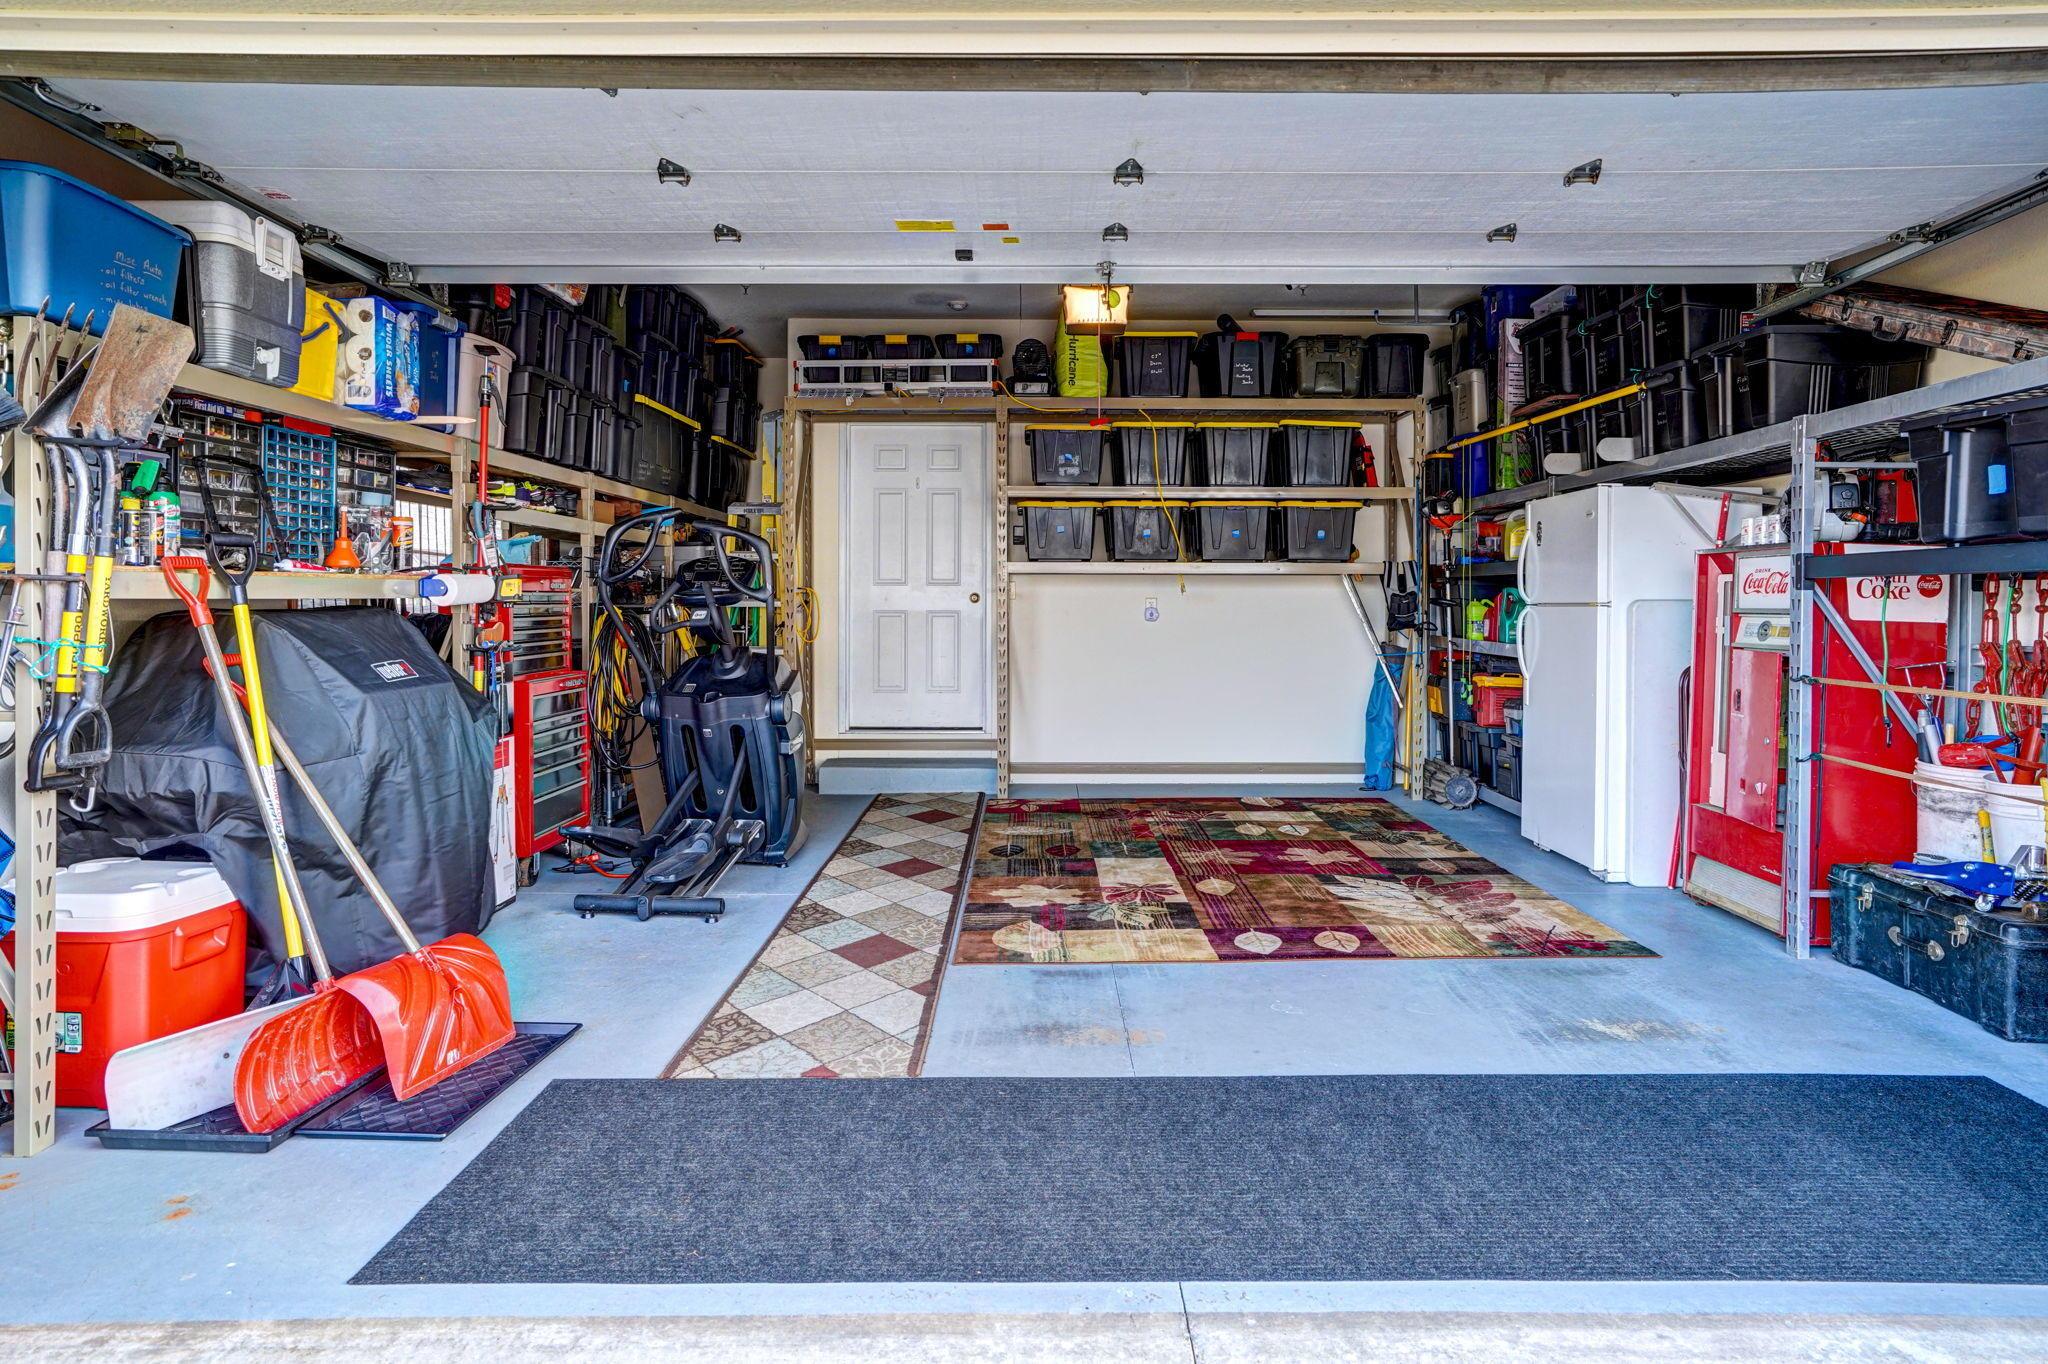 7146 Parkstone Ter, Mount Pleasant, Wisconsin 53406, 3 Bedrooms Bedrooms, ,2 BathroomsBathrooms,Condominiums,For Sale,Parkstone Ter,2,1746347